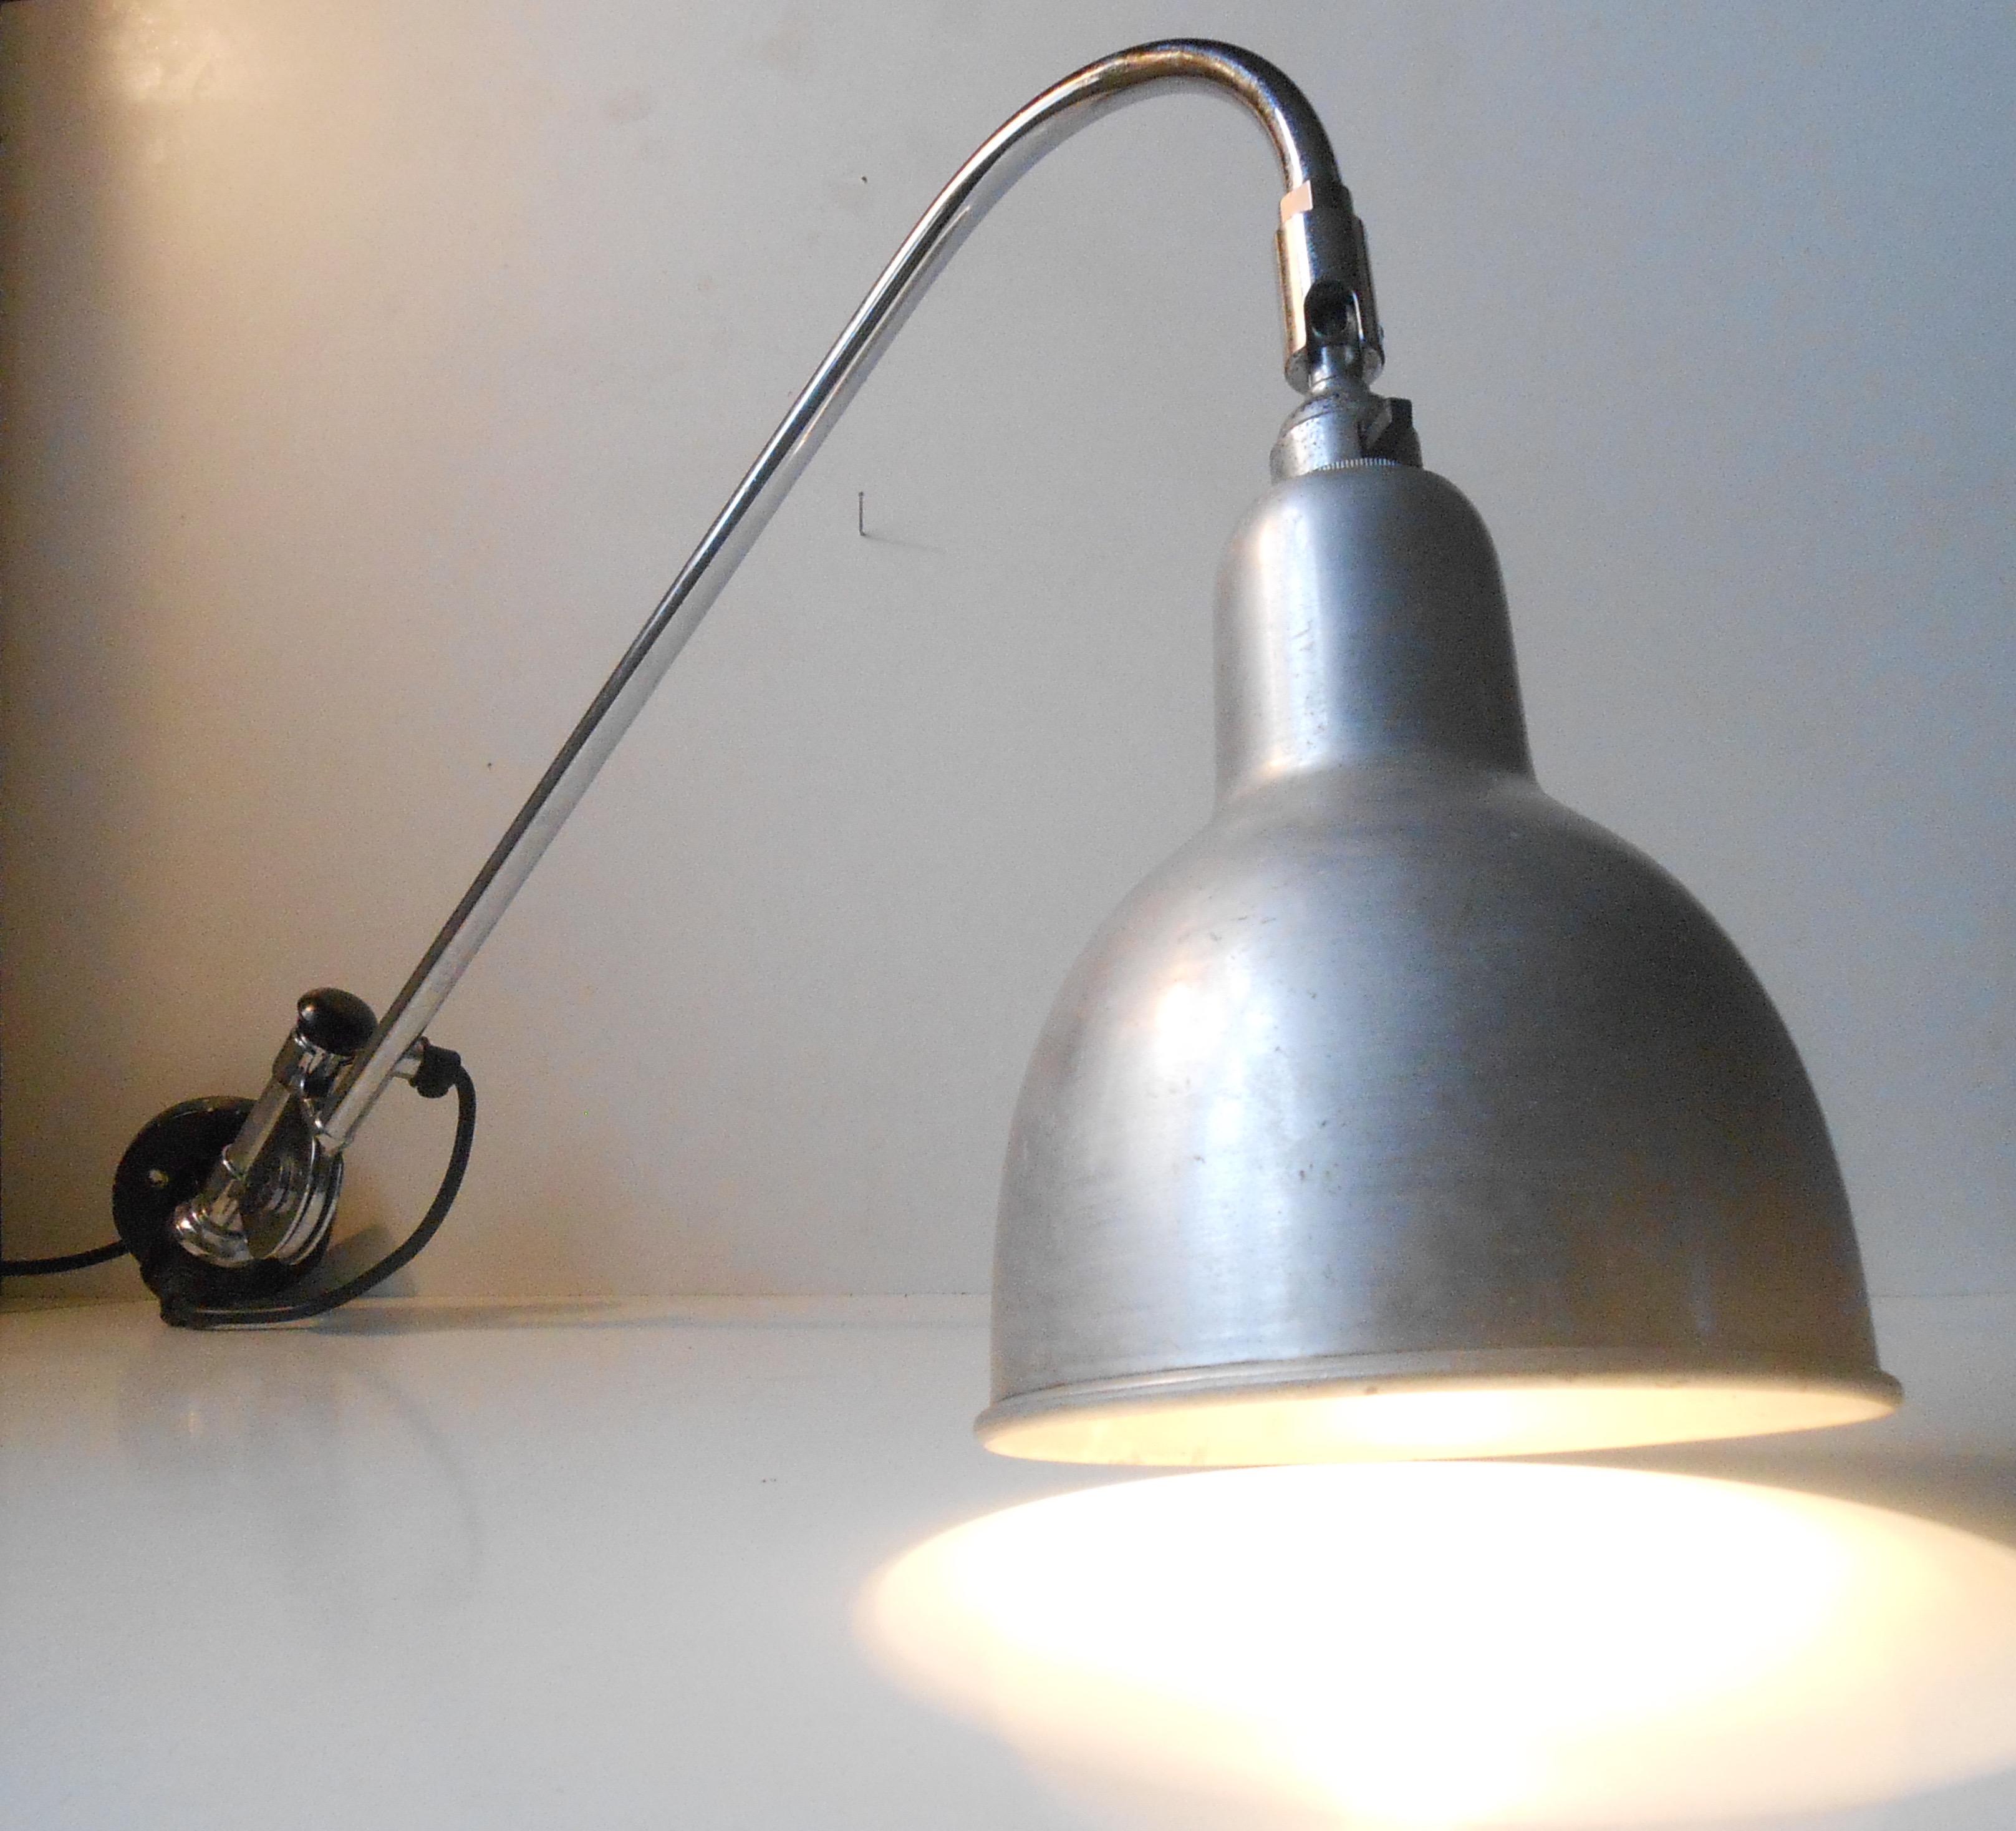 Robert Dudley Best lamper af Robert Dudley Best